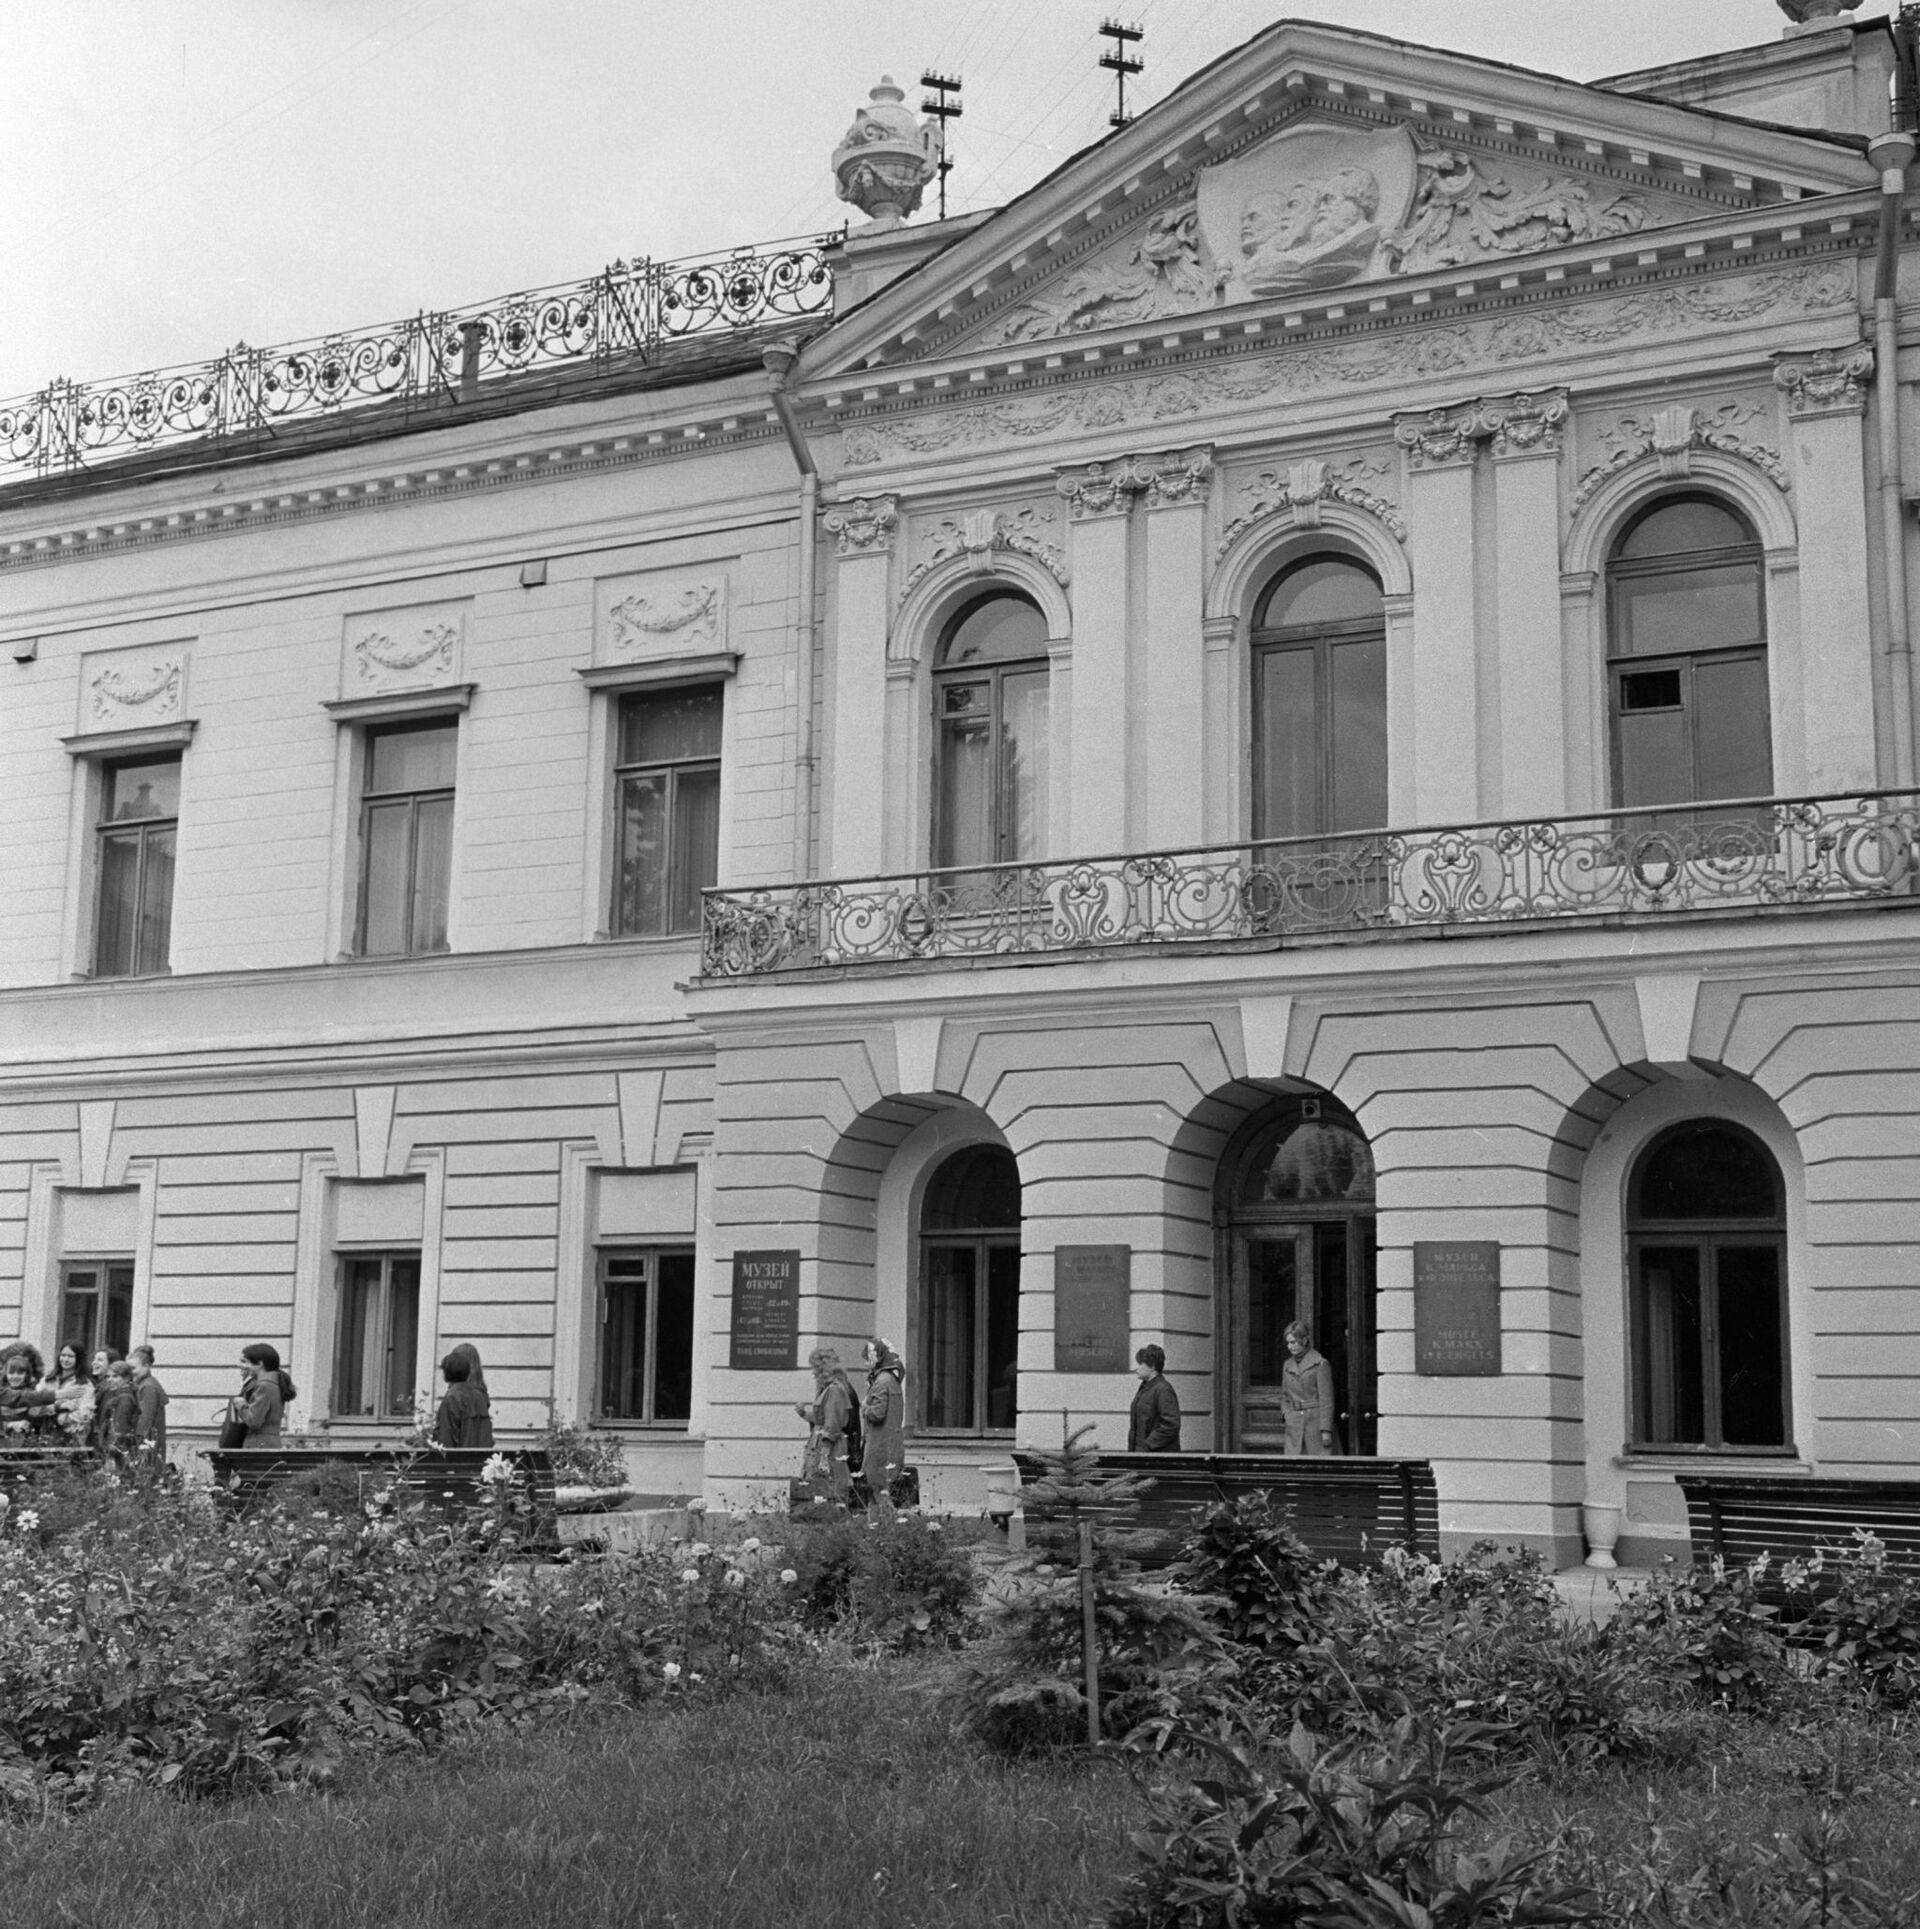 Усадьба Лопухиных - XVII - XVIII век - РИА Новости, 1920, 18.07.2021